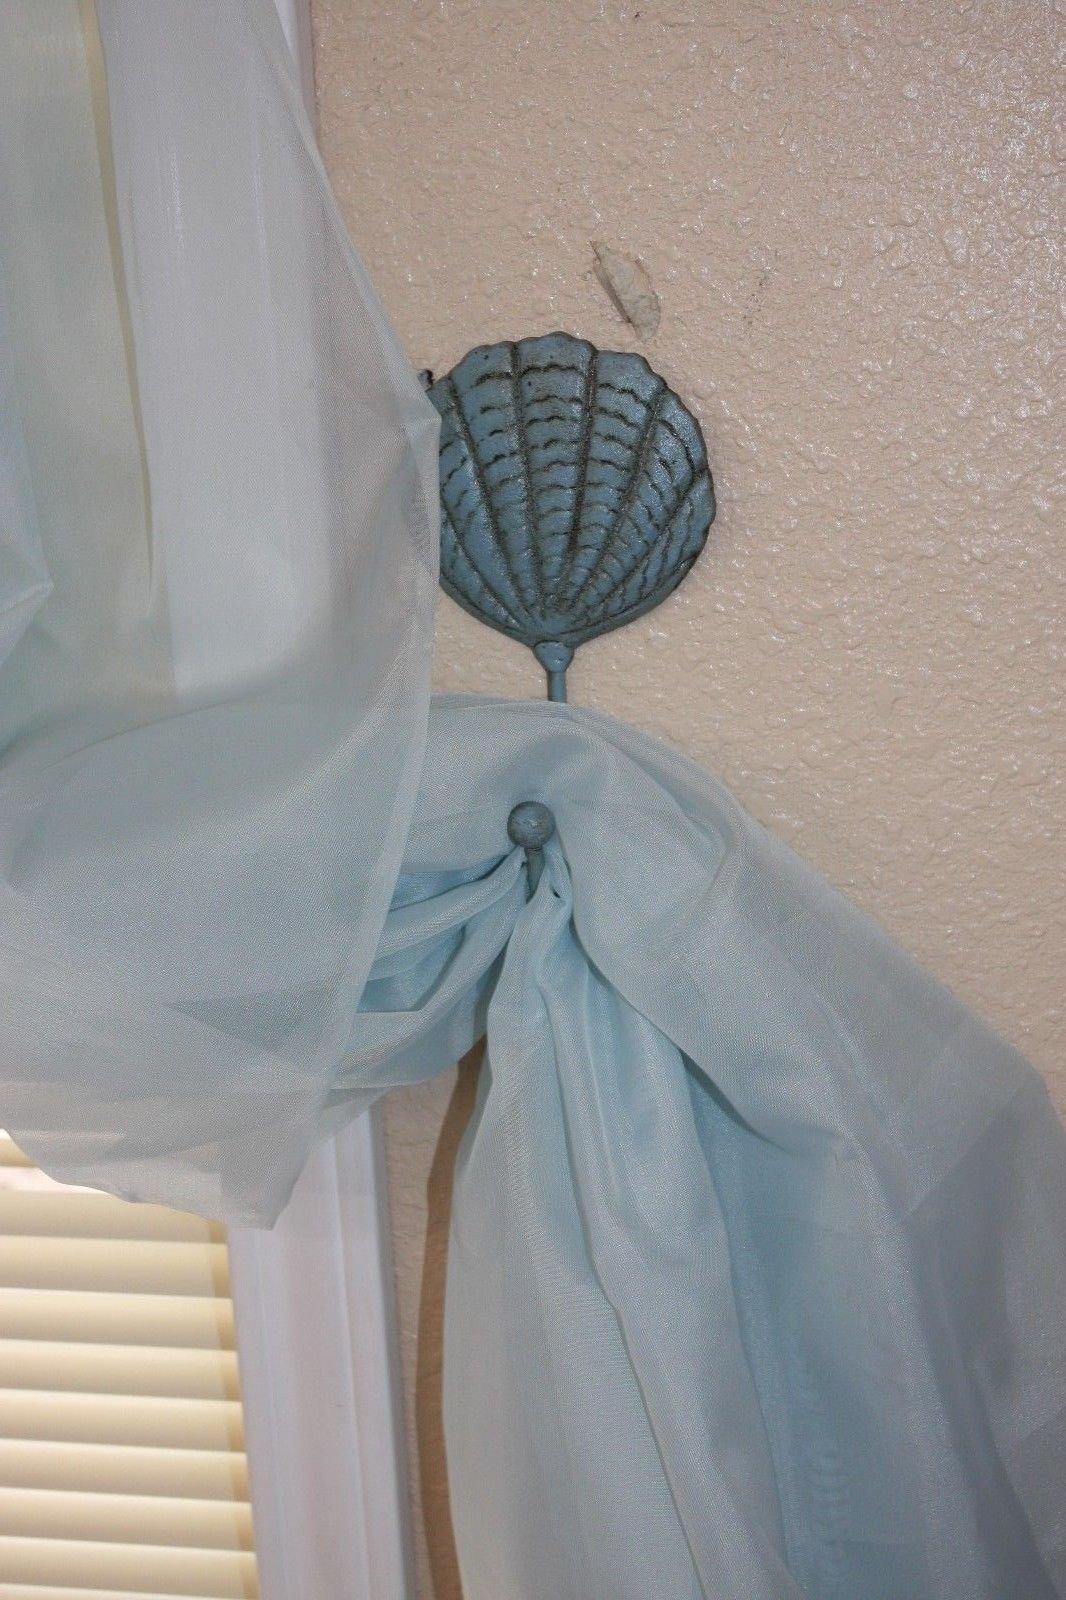 Set of 10 Seashell Design Curtain Tie Backs Hold Backs Cast Iron 7 inches tall Coastal Living Beach House Window Treatment, N-49a